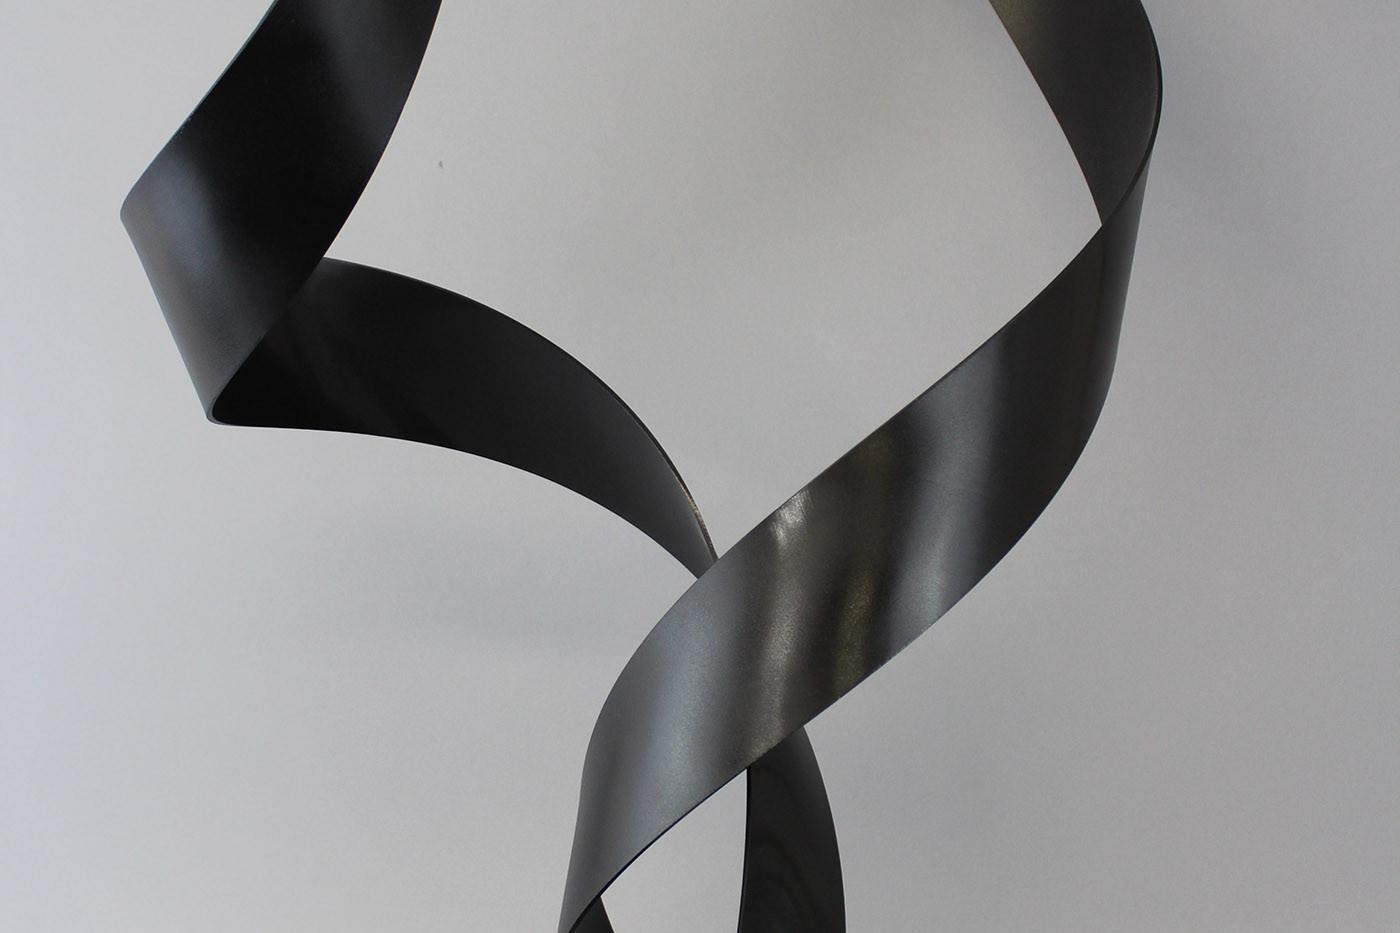 Black-Twist-Steel-powder-coated-213-x-20